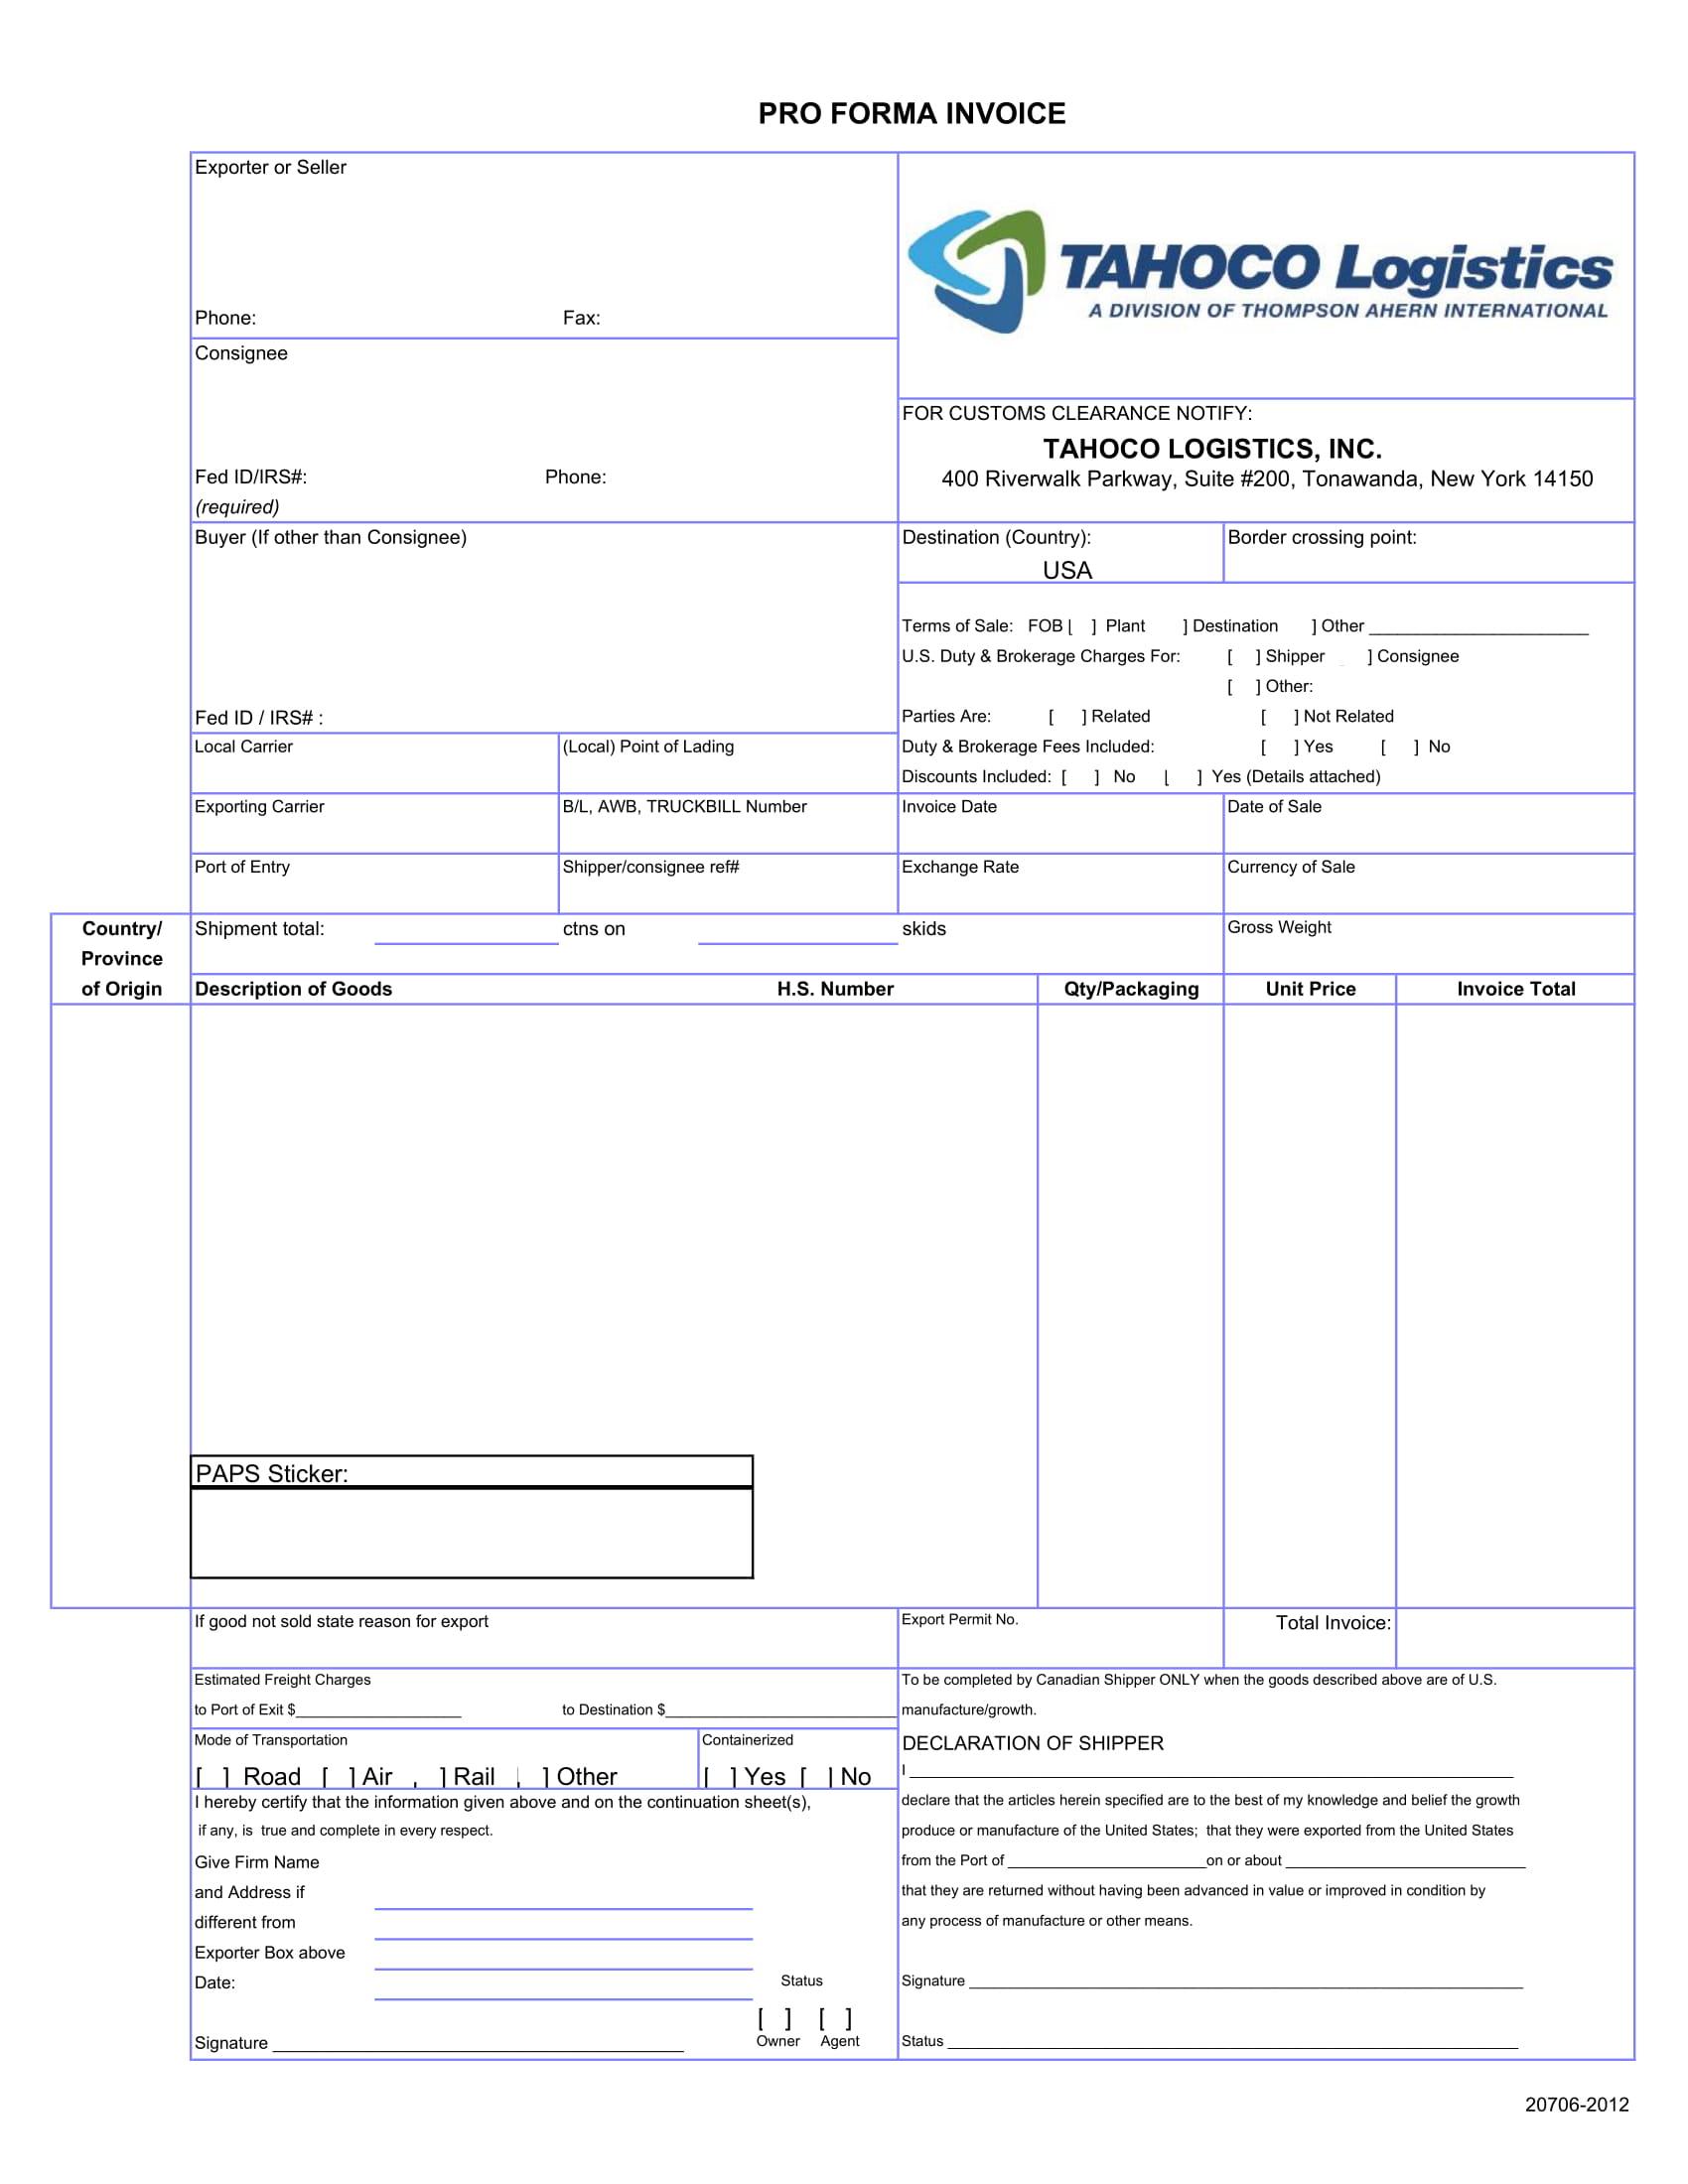 tahoco pro forma invoice example